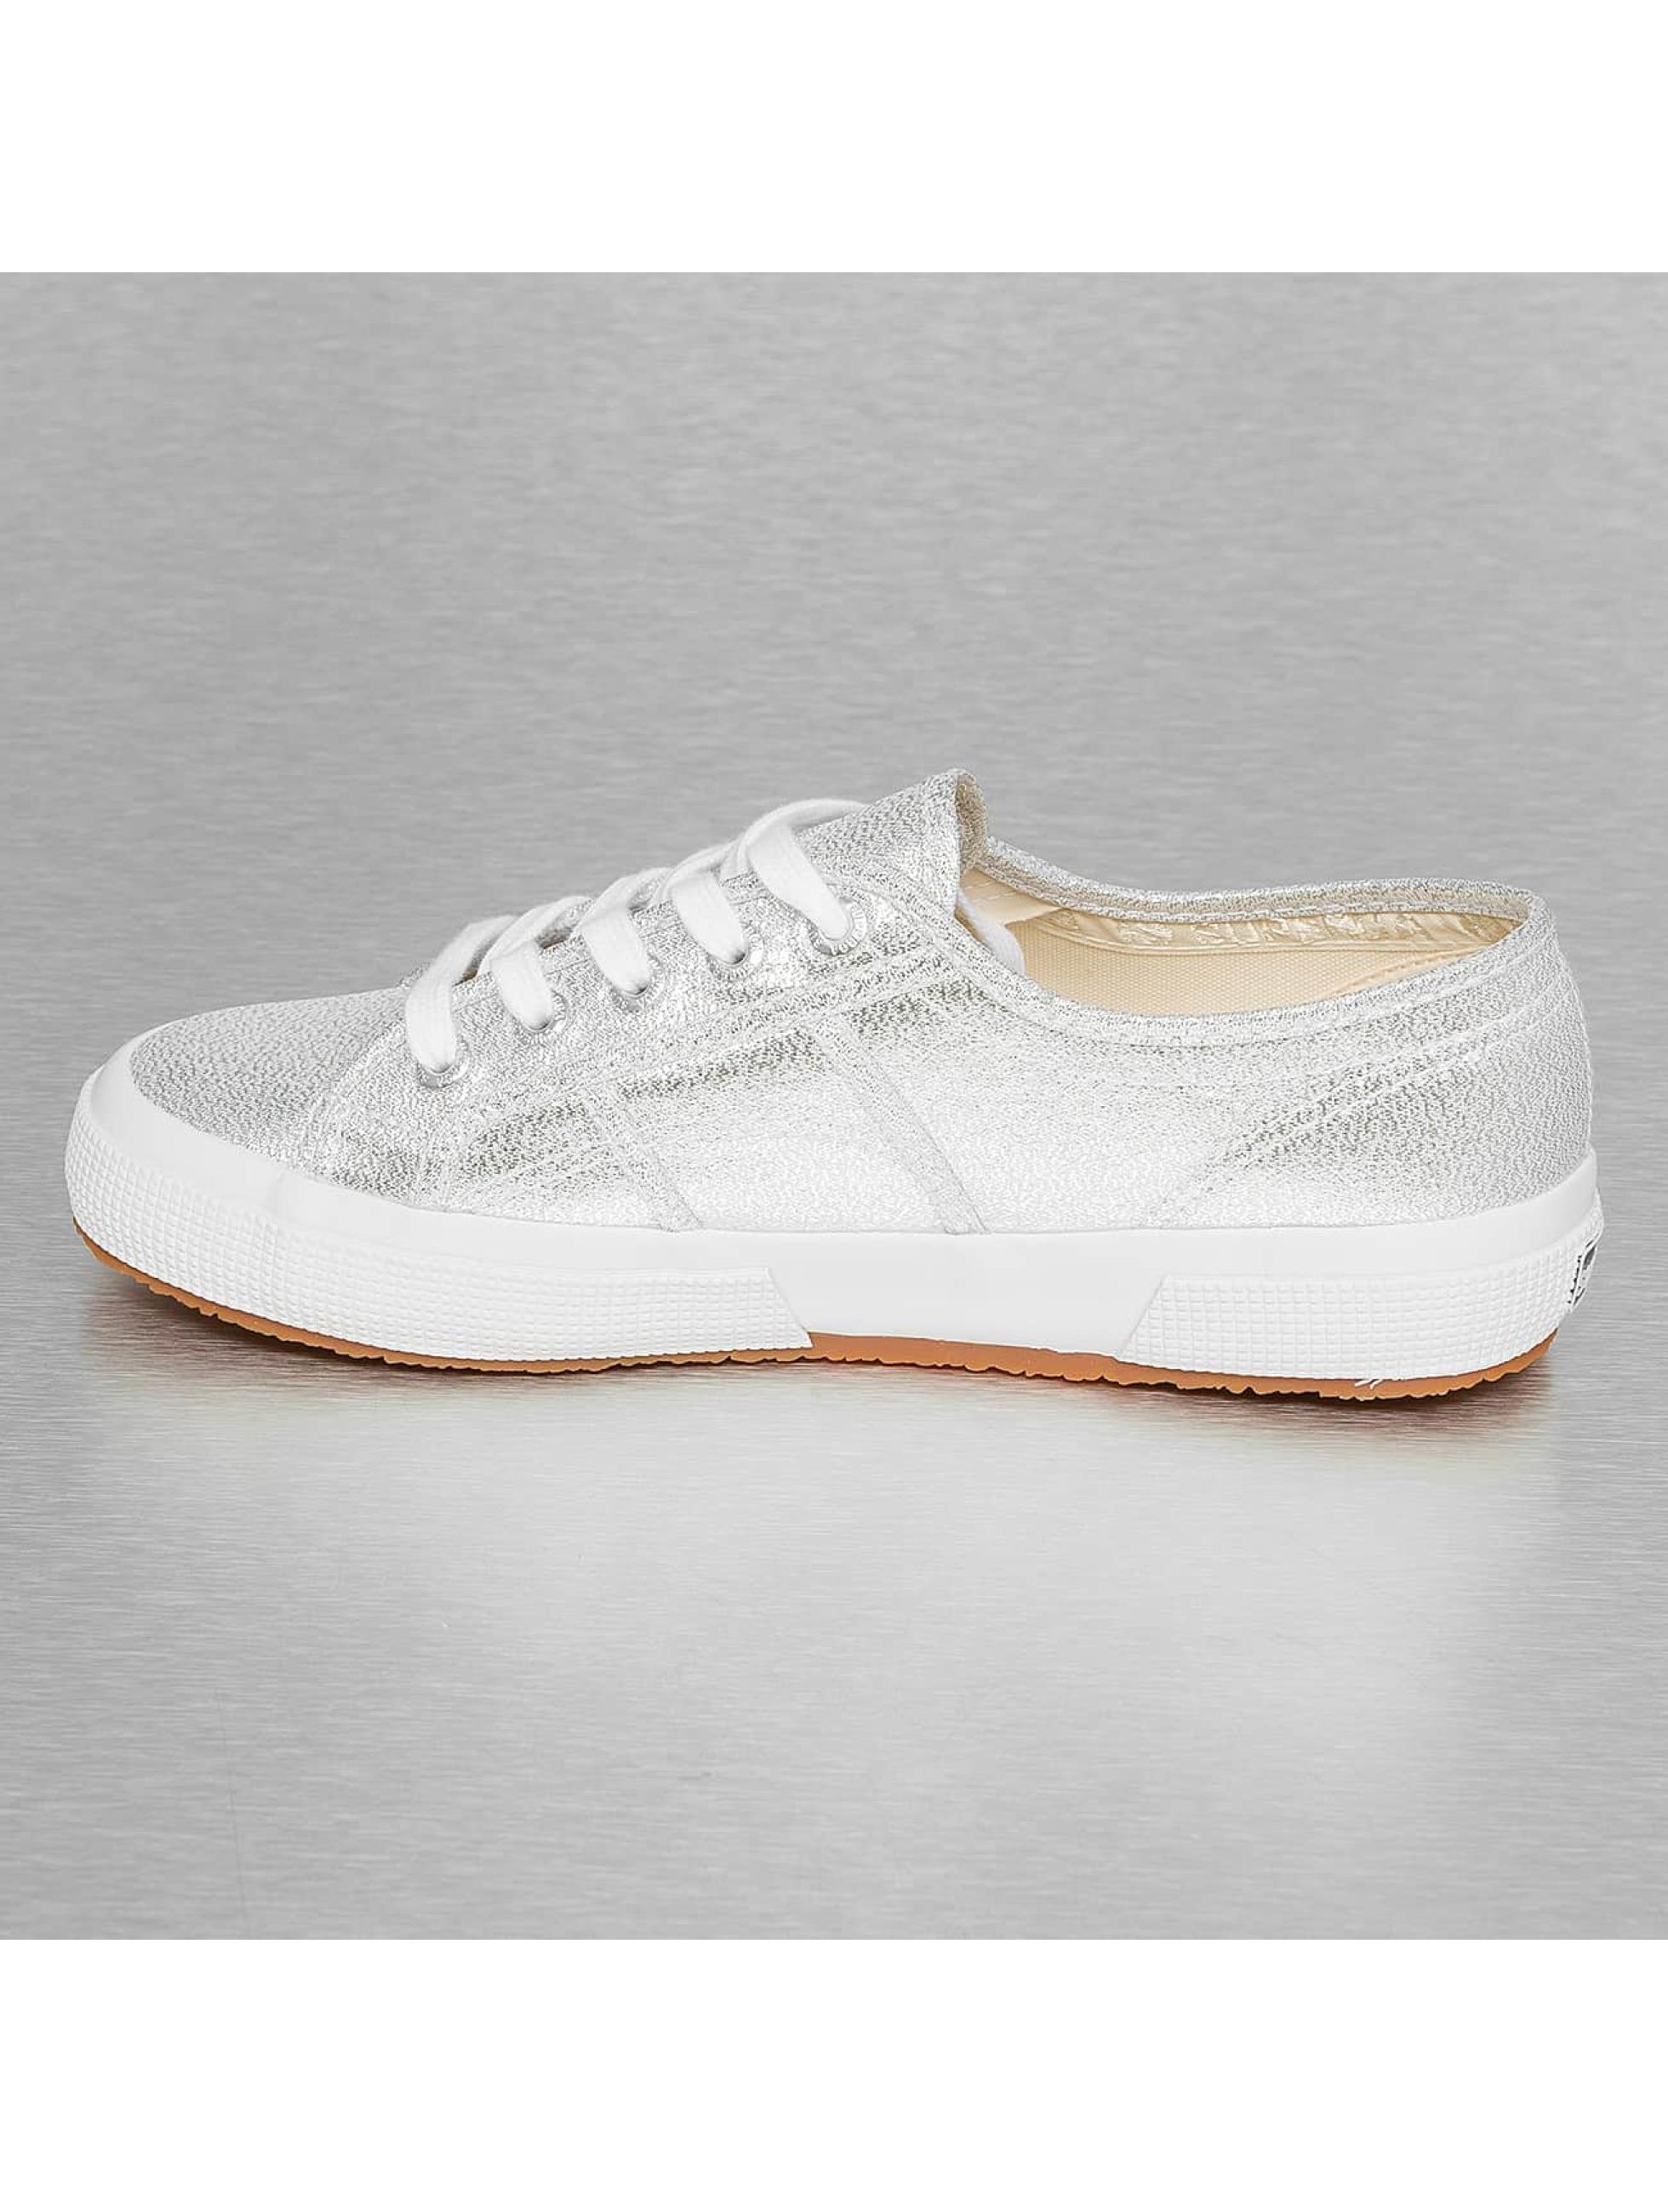 Superga Sneakers 2750 Lamew strieborná